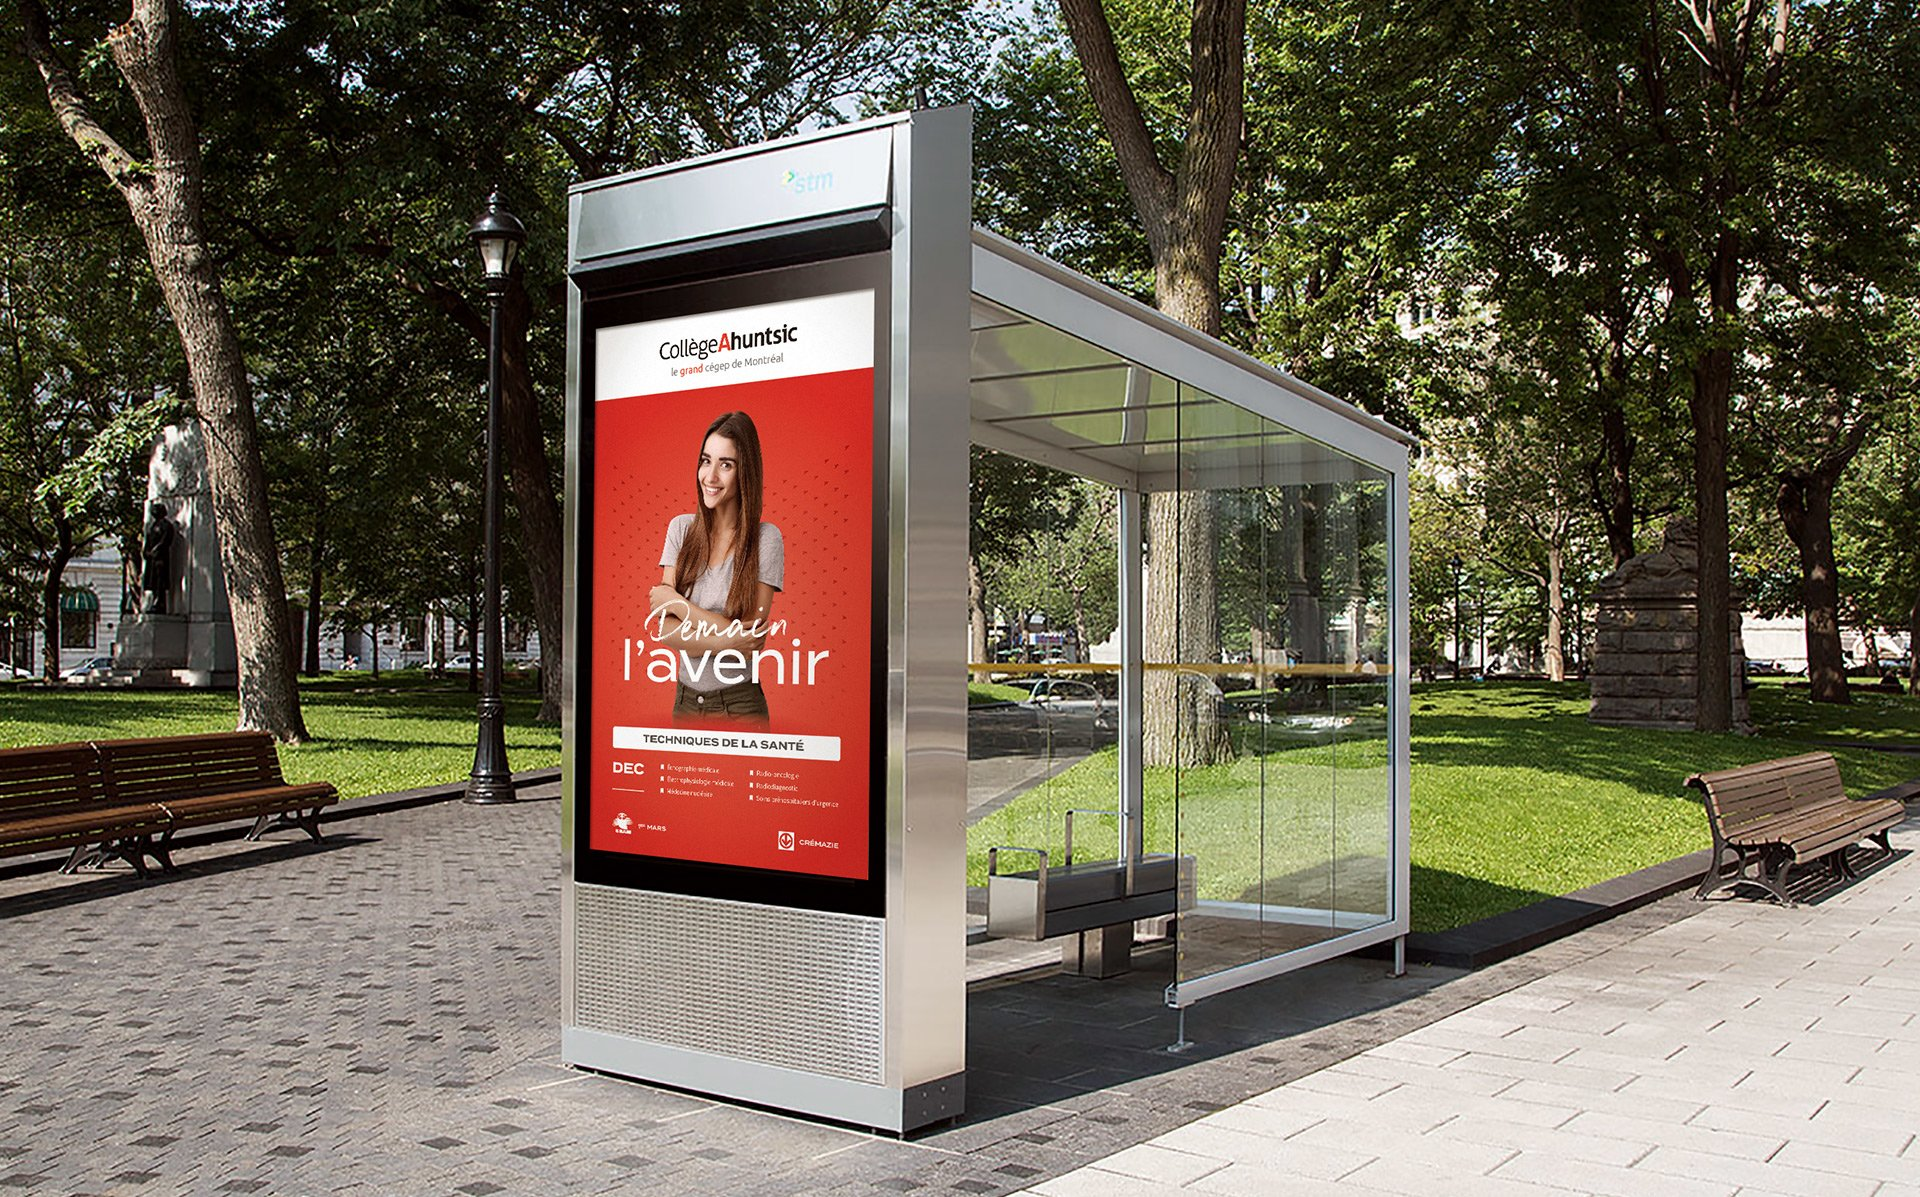 Abribus - Campagne Publicitaire - Demain l'avenir - Collège Ahuntsic